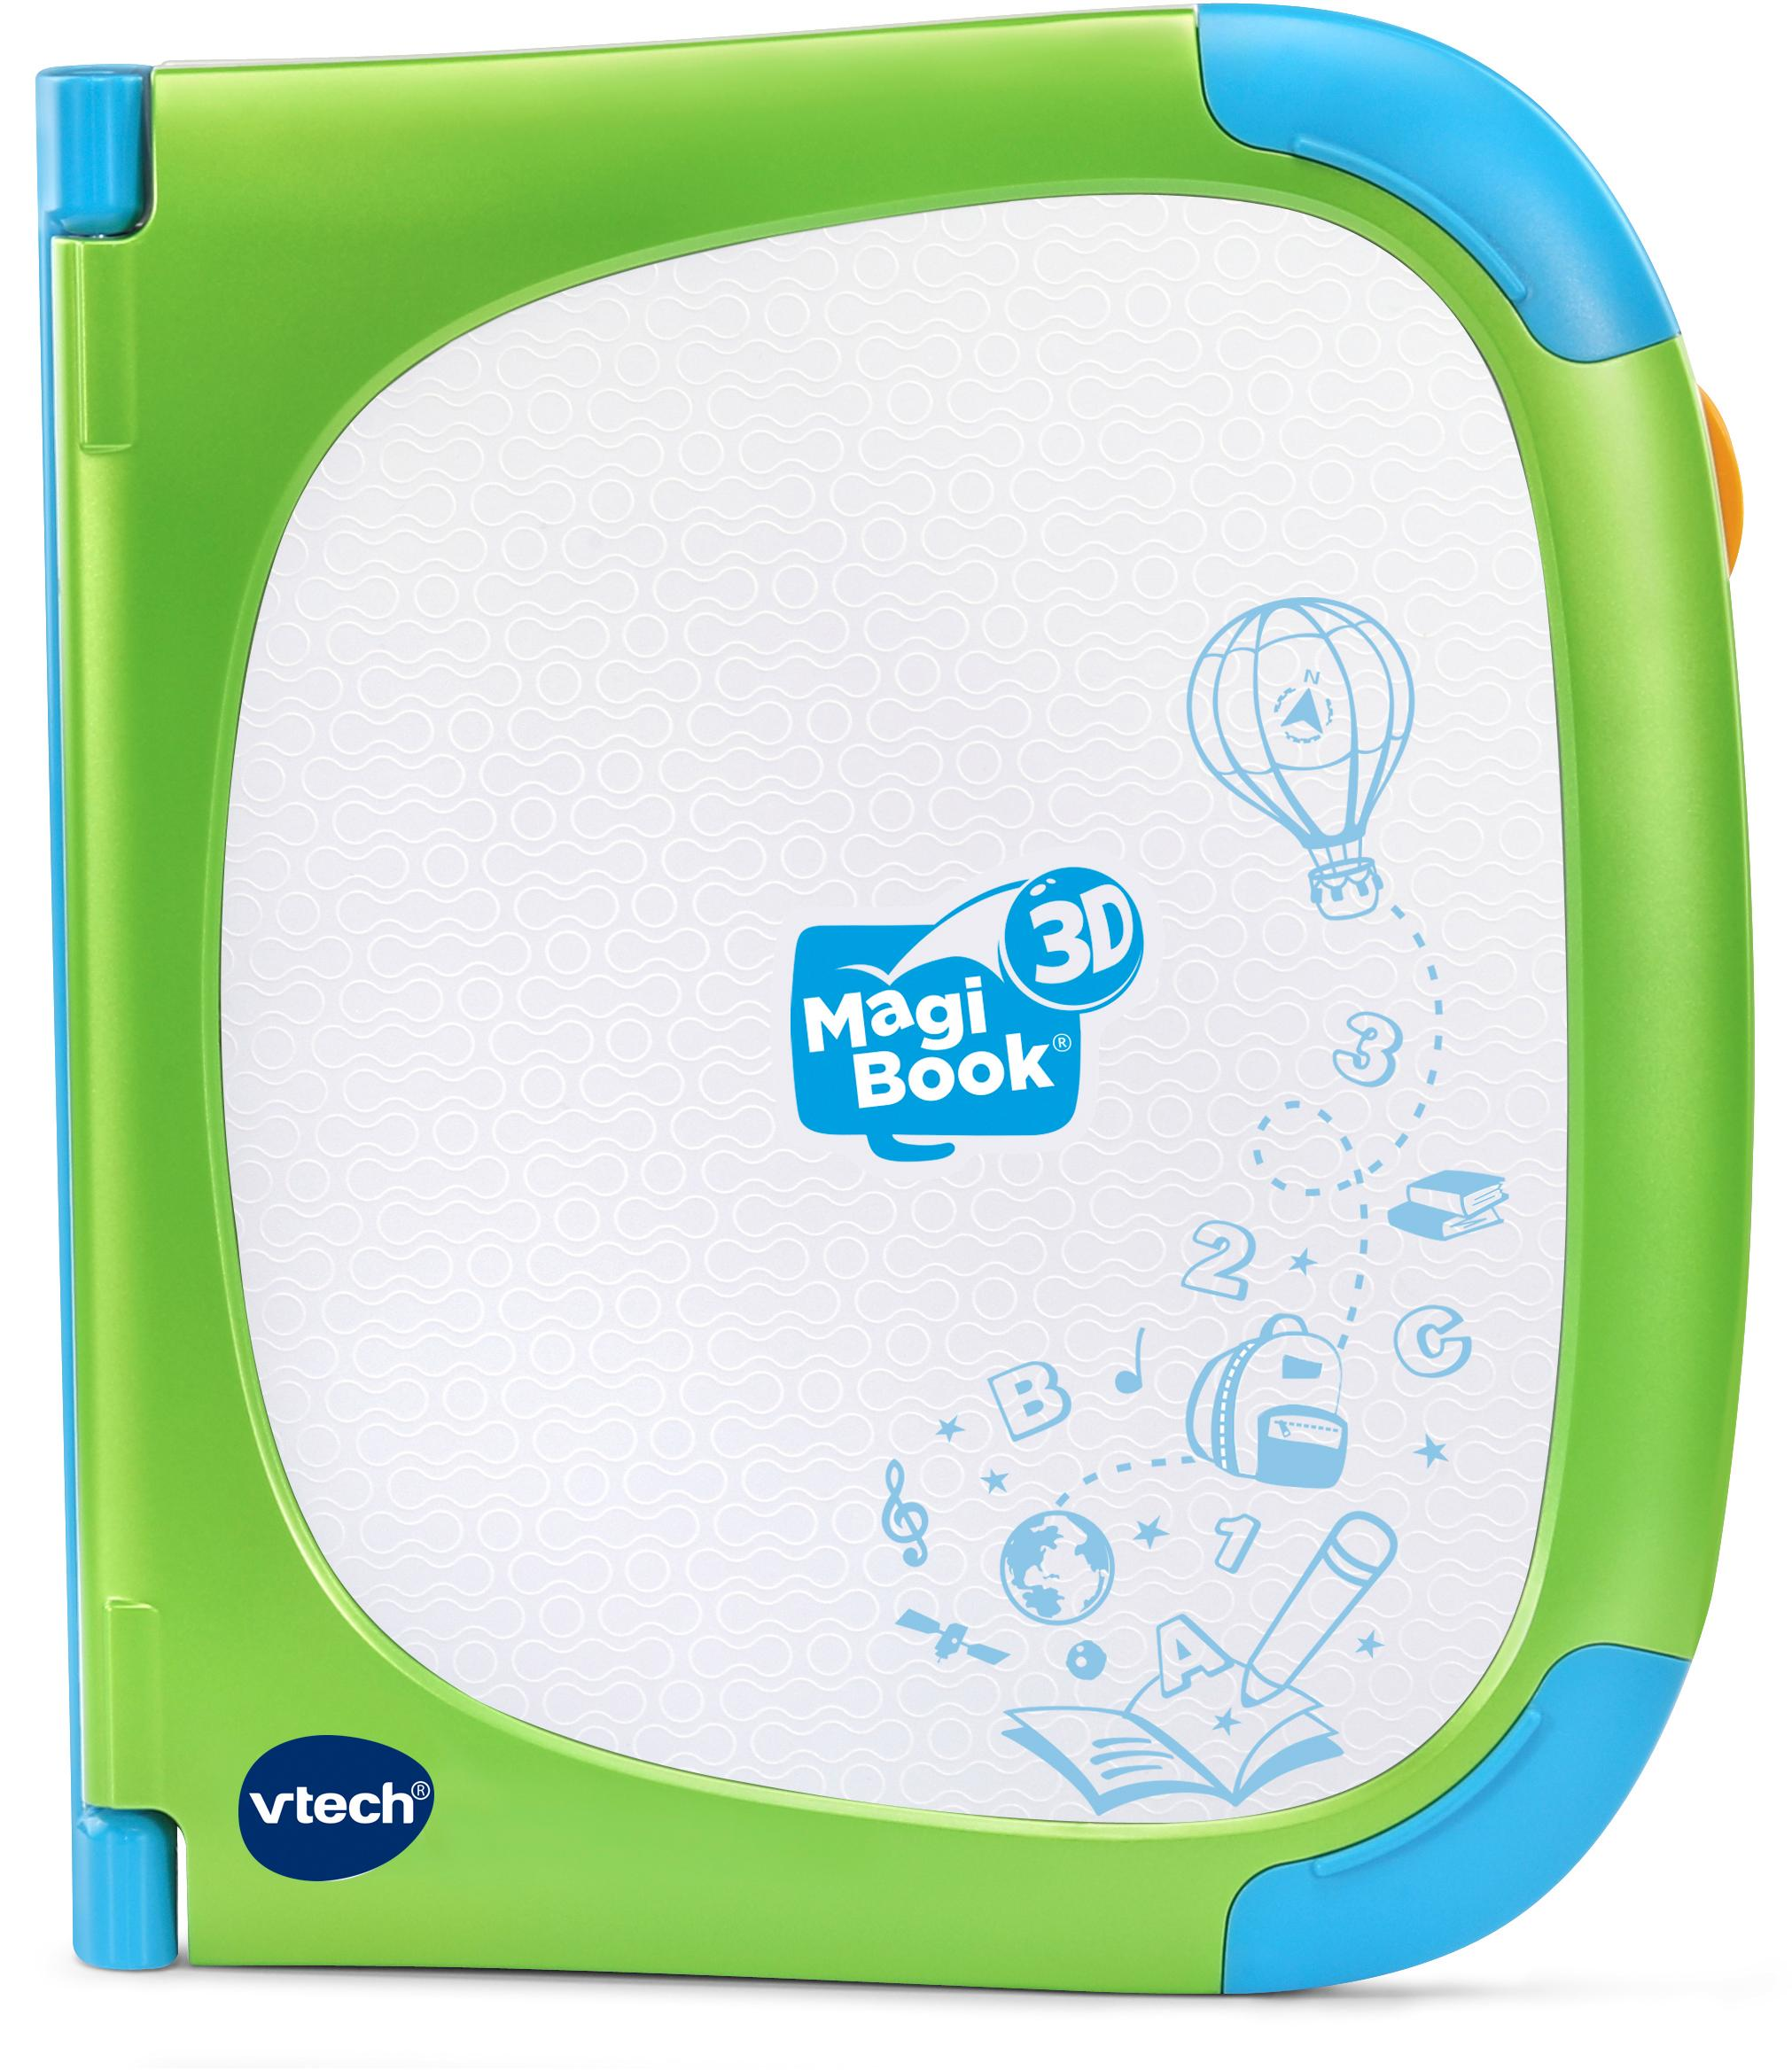 Vtech Kindercomputer MagiBook 3D, grün Kinder Kinder-Computer Lernspielzeug